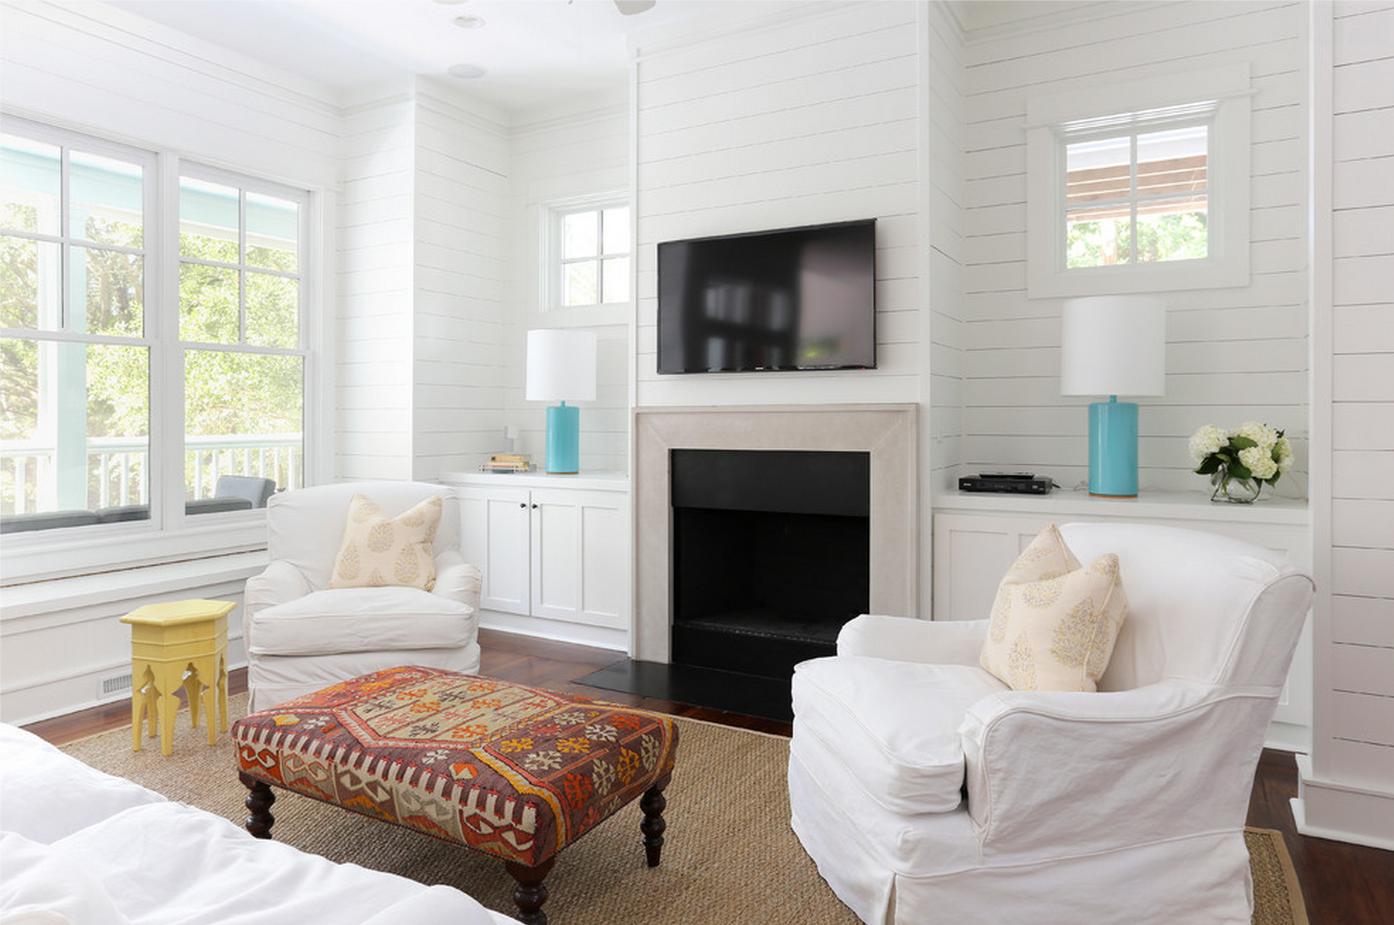 Amy Trowman Sullivans Beach House No. 3 - beach-style - Living Room ...